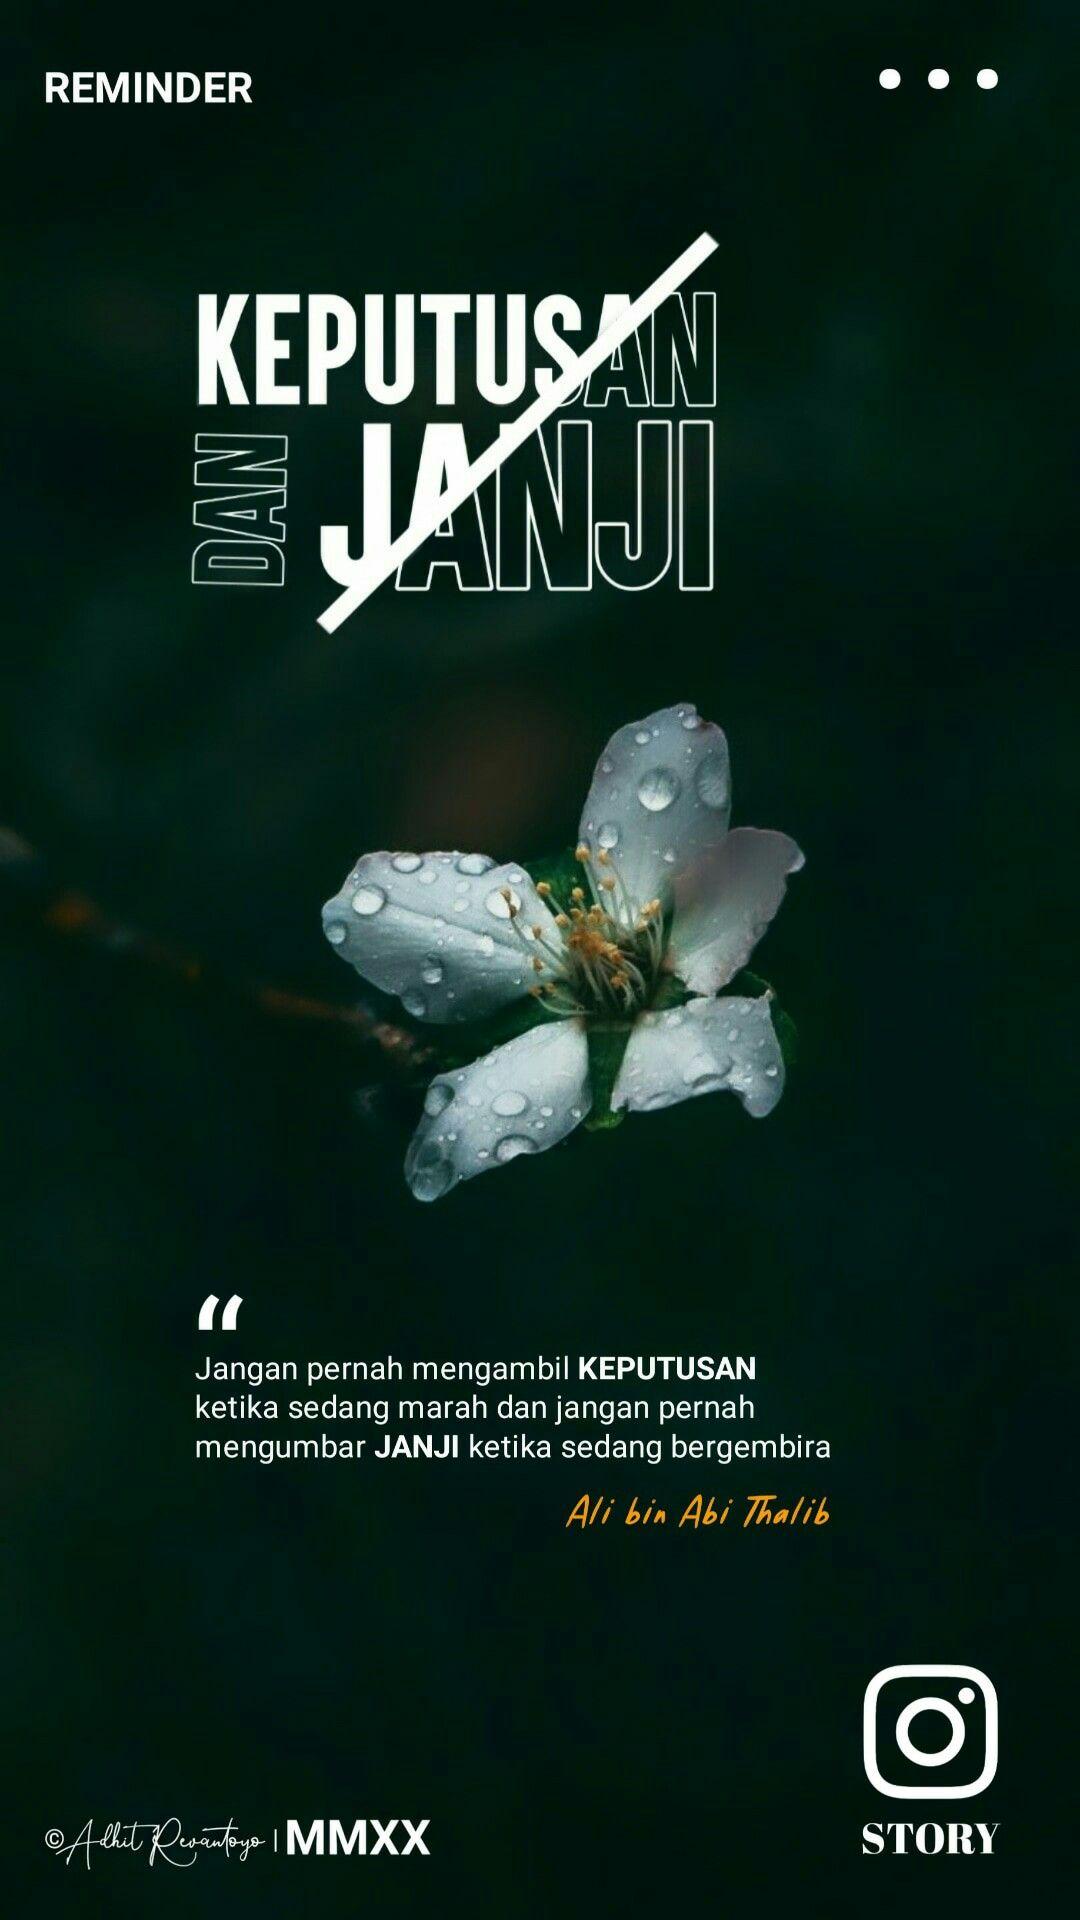 Pin oleh Rahayu Putri Romadhona di TIPOGRAFI di 2020 ...